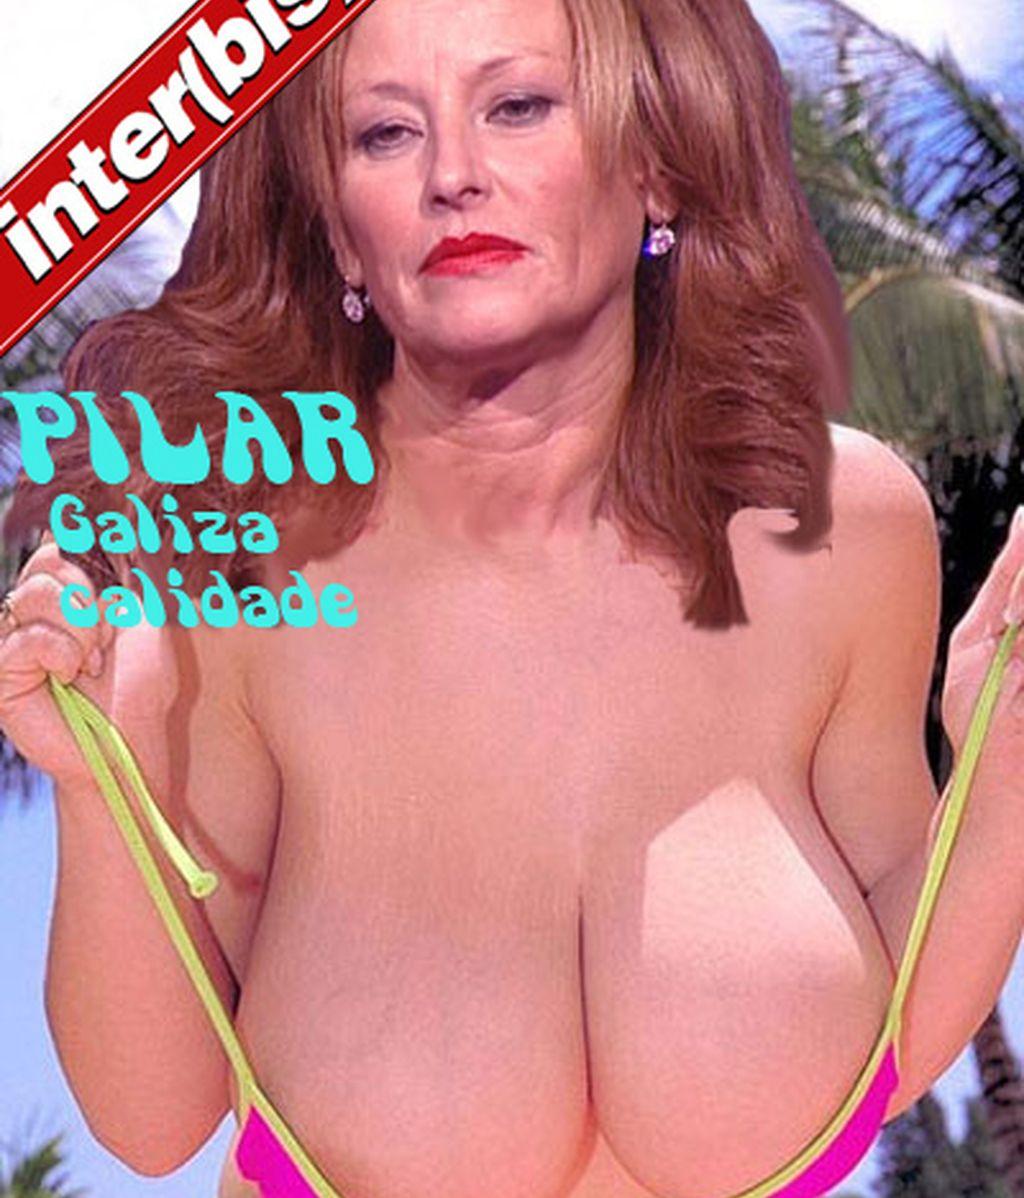 Todos desnudos a las portadas